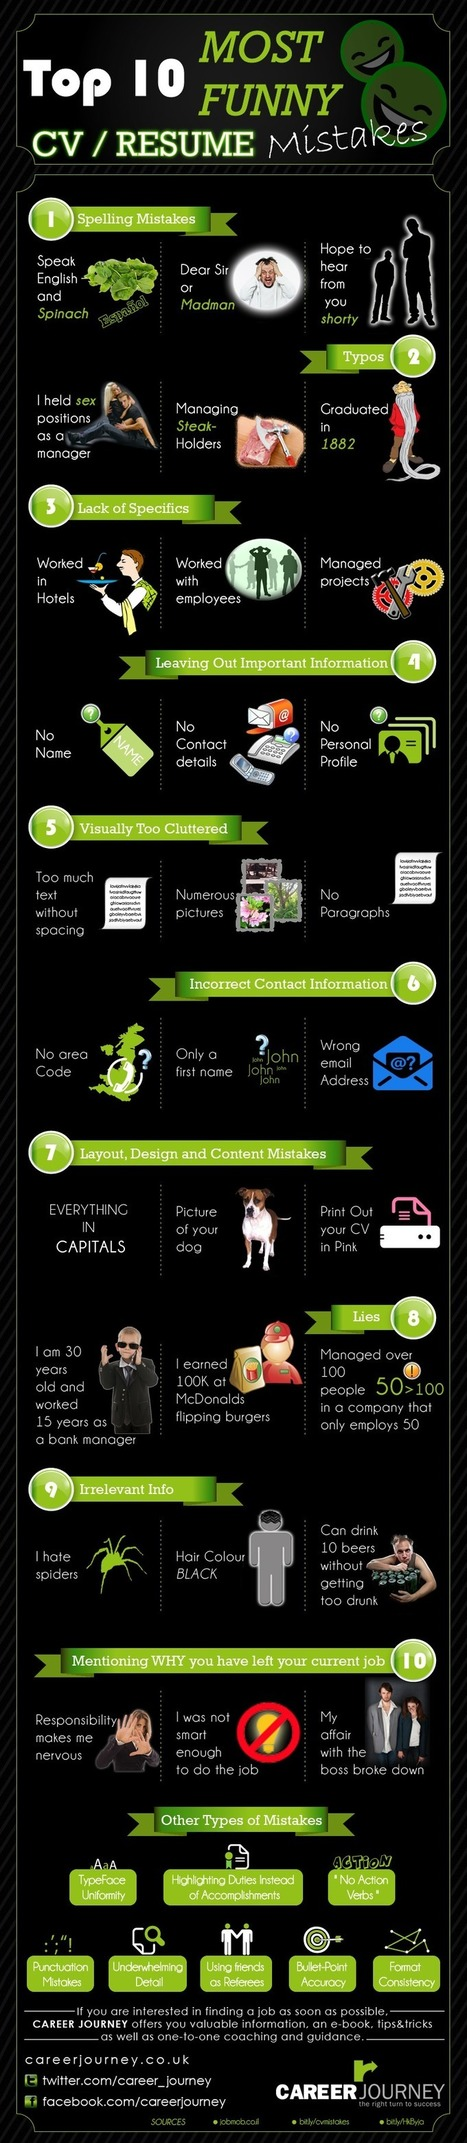 CV en anglais : 10 erreurs courantes | Réussir son CV | Scoop.it